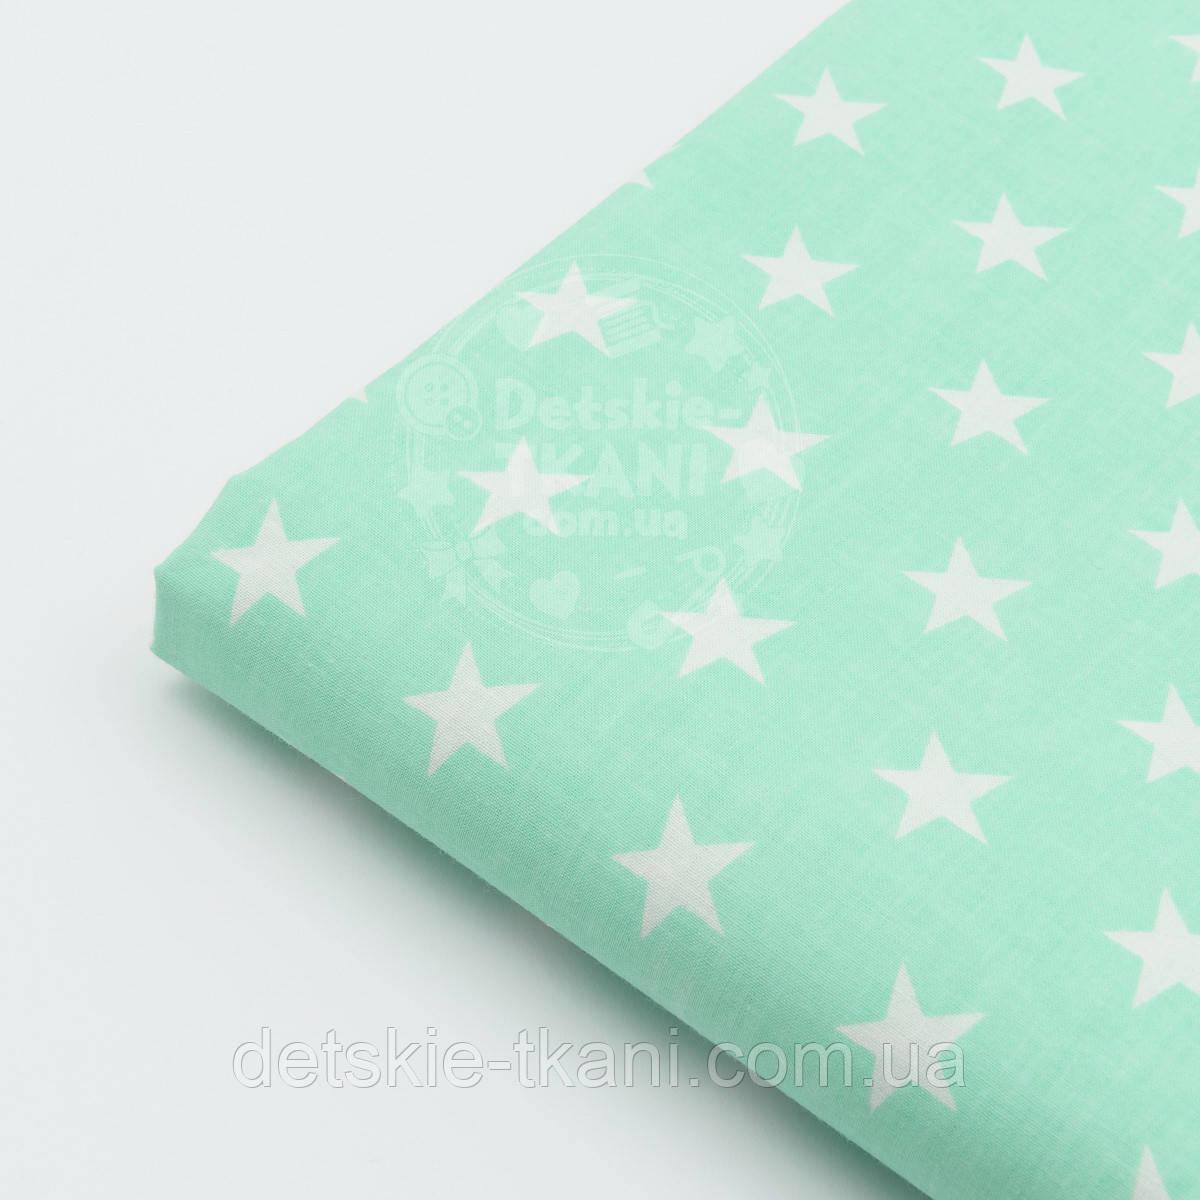 Отрез ткани №44а  с белыми звёздочками на салатовом фоне